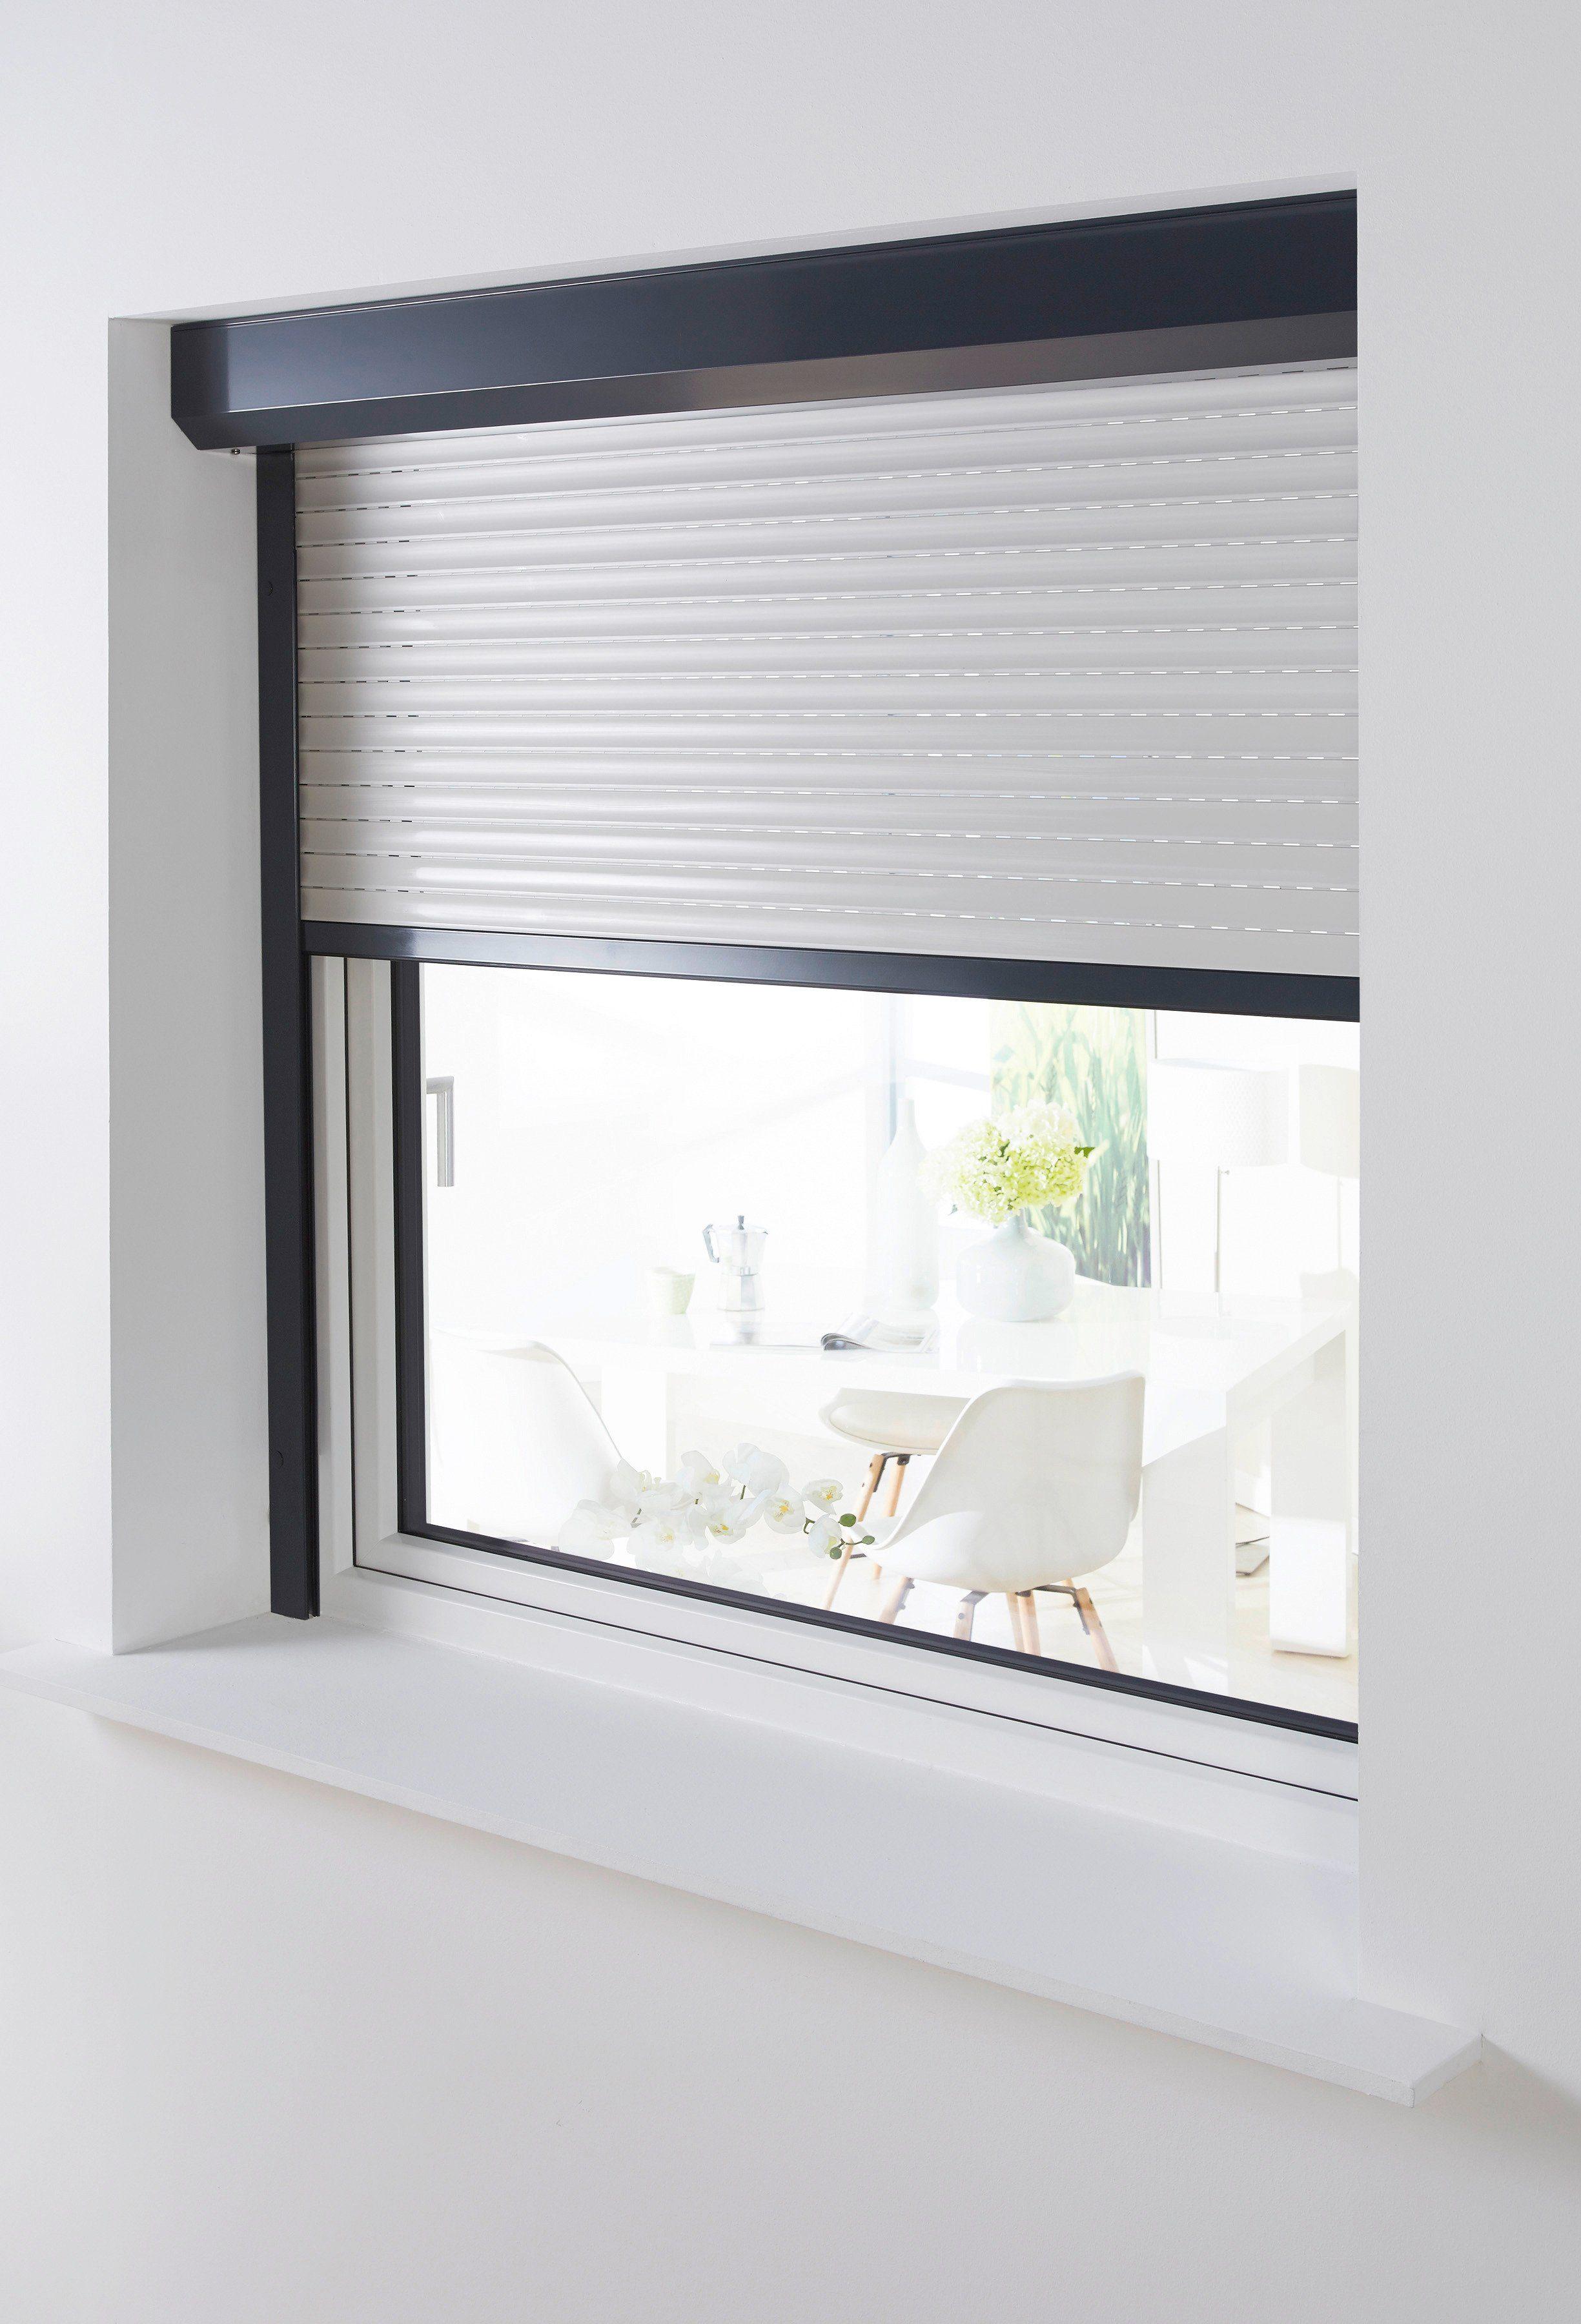 Aluminium »Vorbau-Rollladen« Sondermaß Breite, Höhe: 235 cm, anthrazit-grau